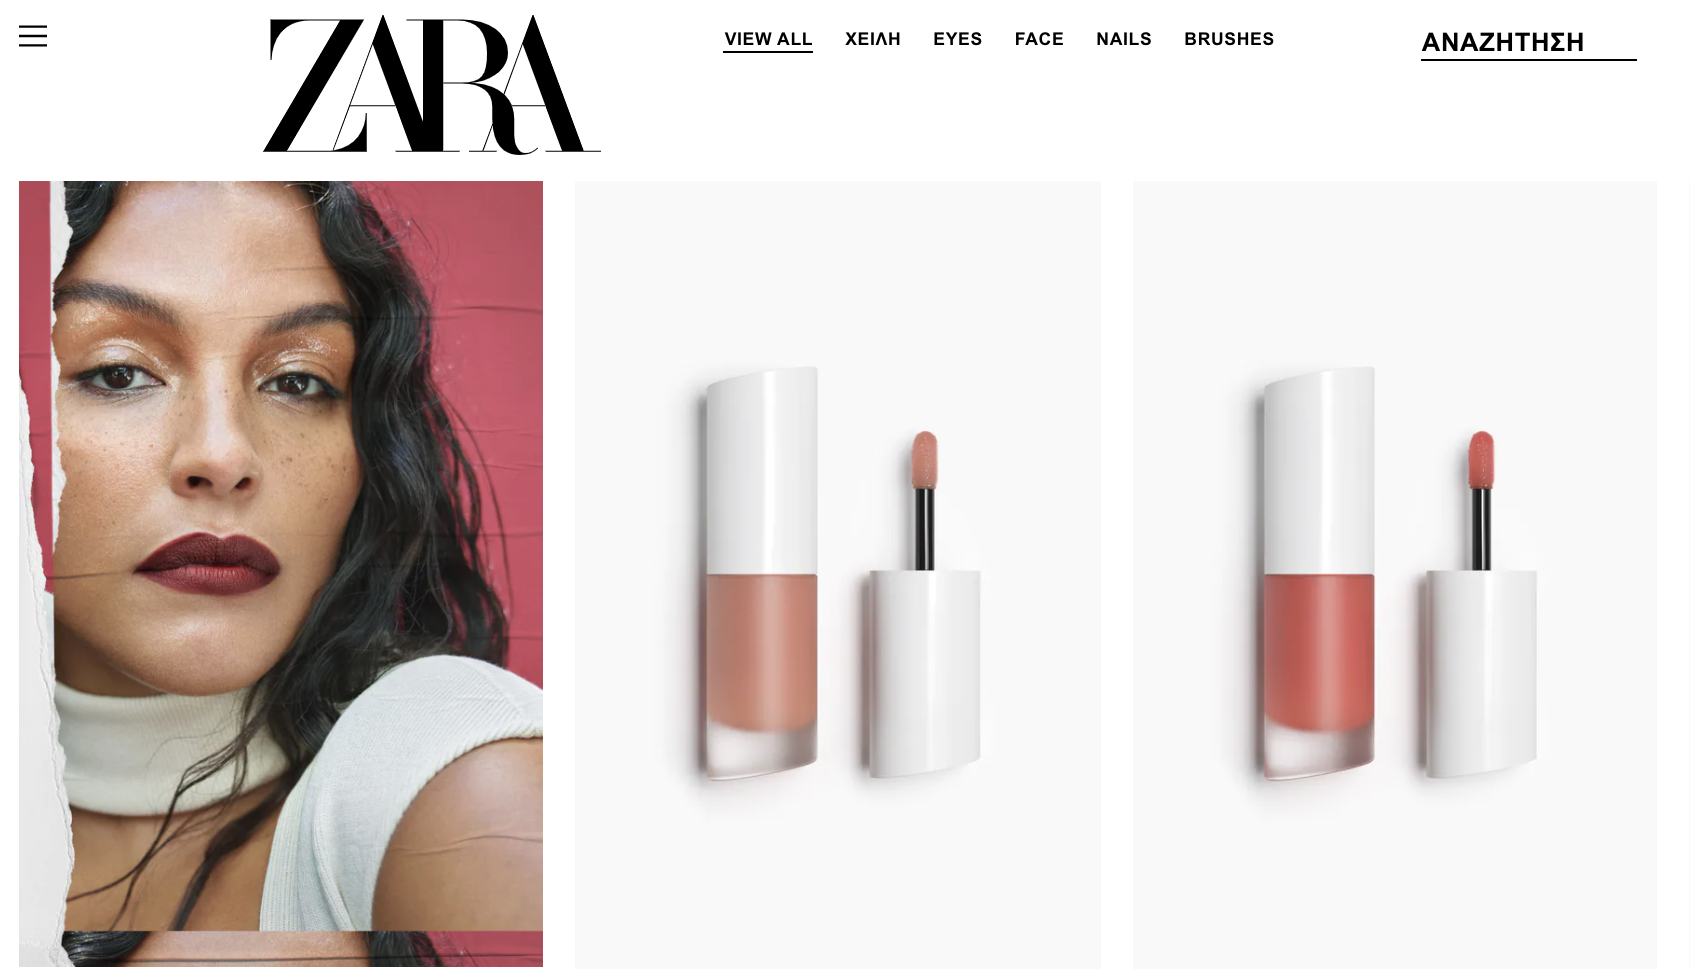 Zara Beauty | Τα καλλυντικά που αξίζουν την προσοχή σου